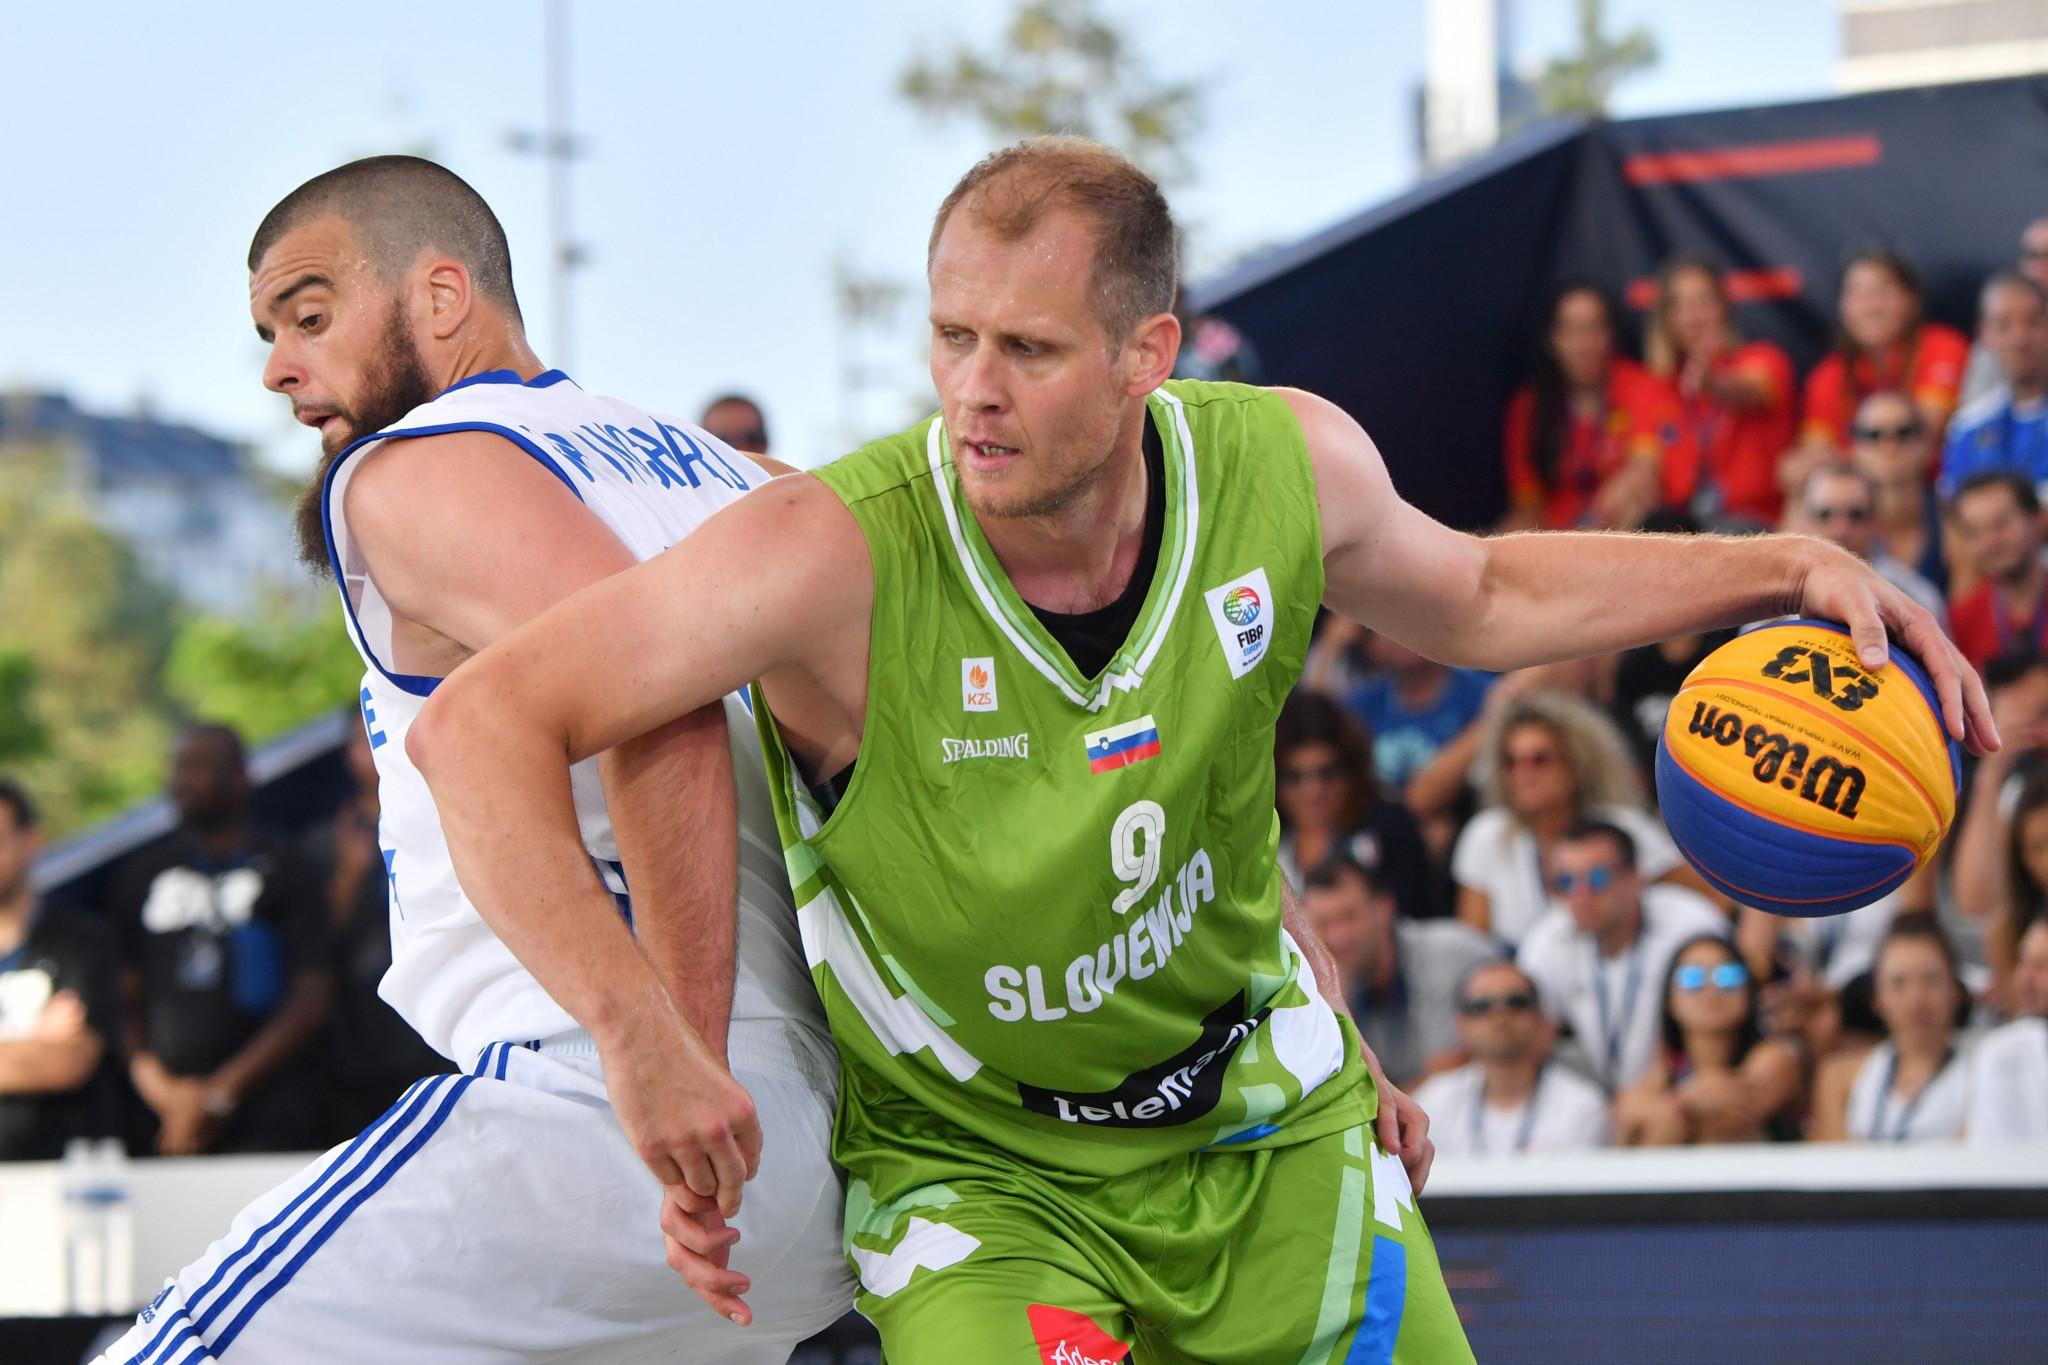 Hungary to host final 3x3 basketball qualifier as teams eye last Tokyo 2020 spot